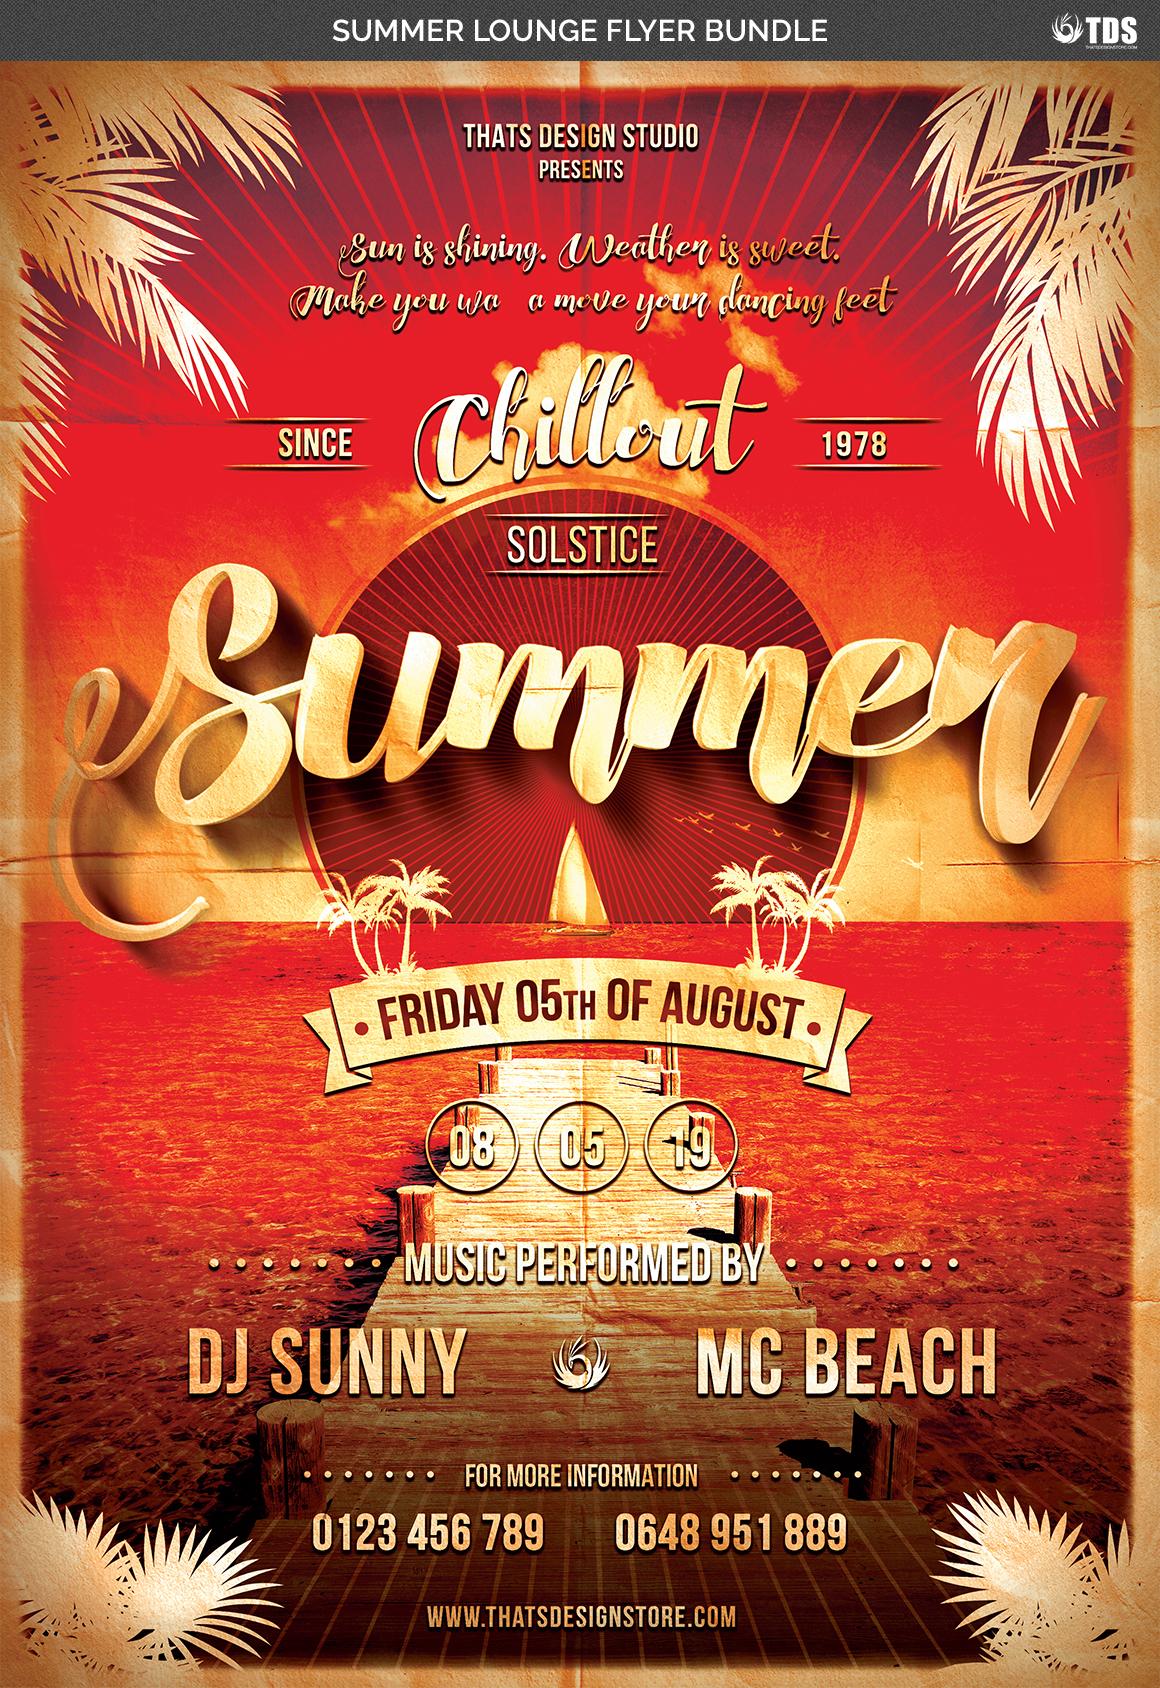 Summer Lounge Flyer Bundle example image 7